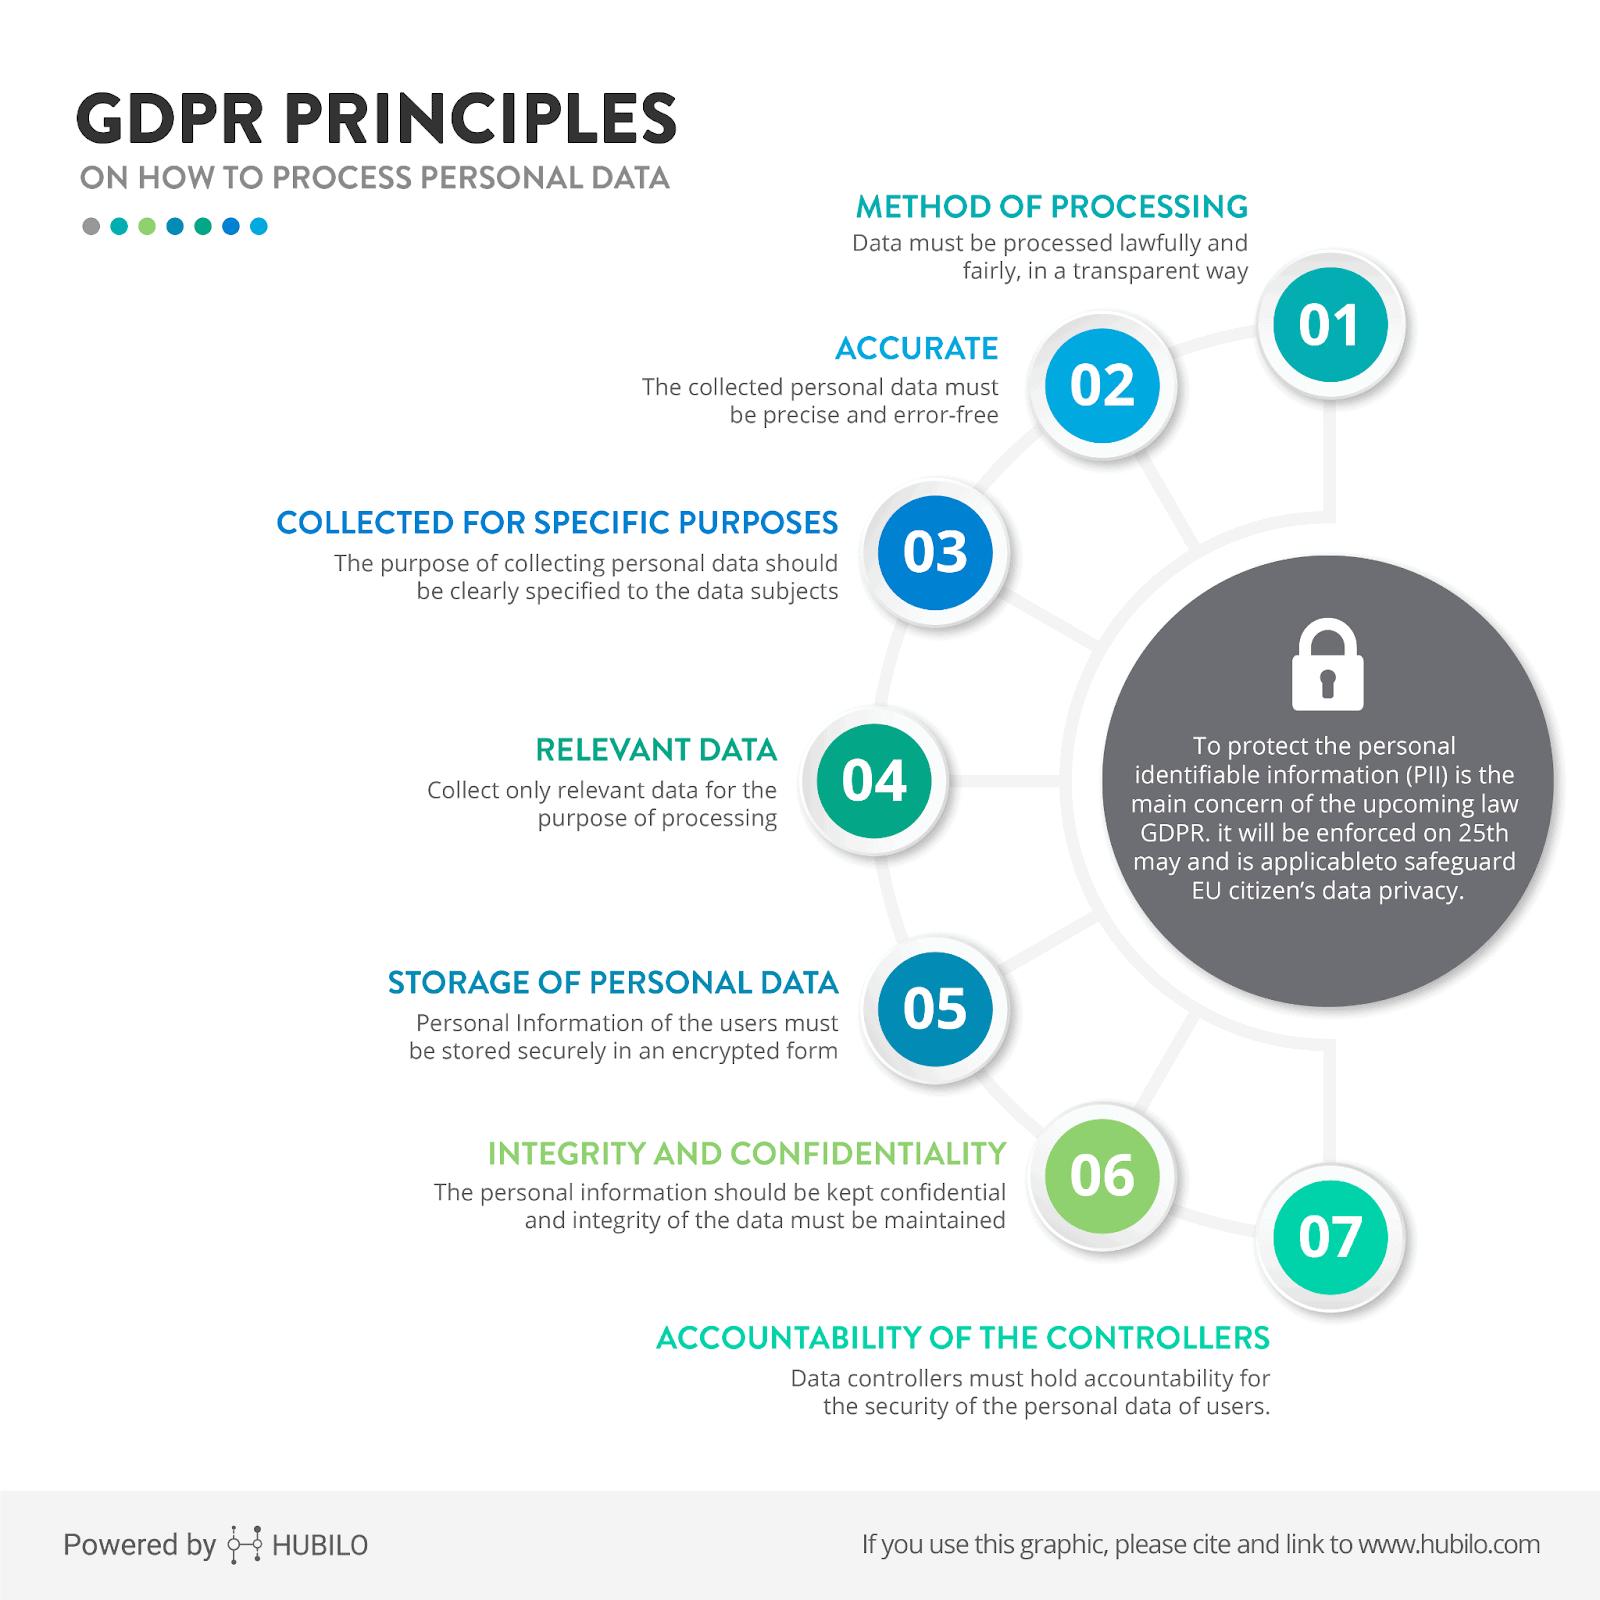 General data protection regulation (GDPR) guidelines.